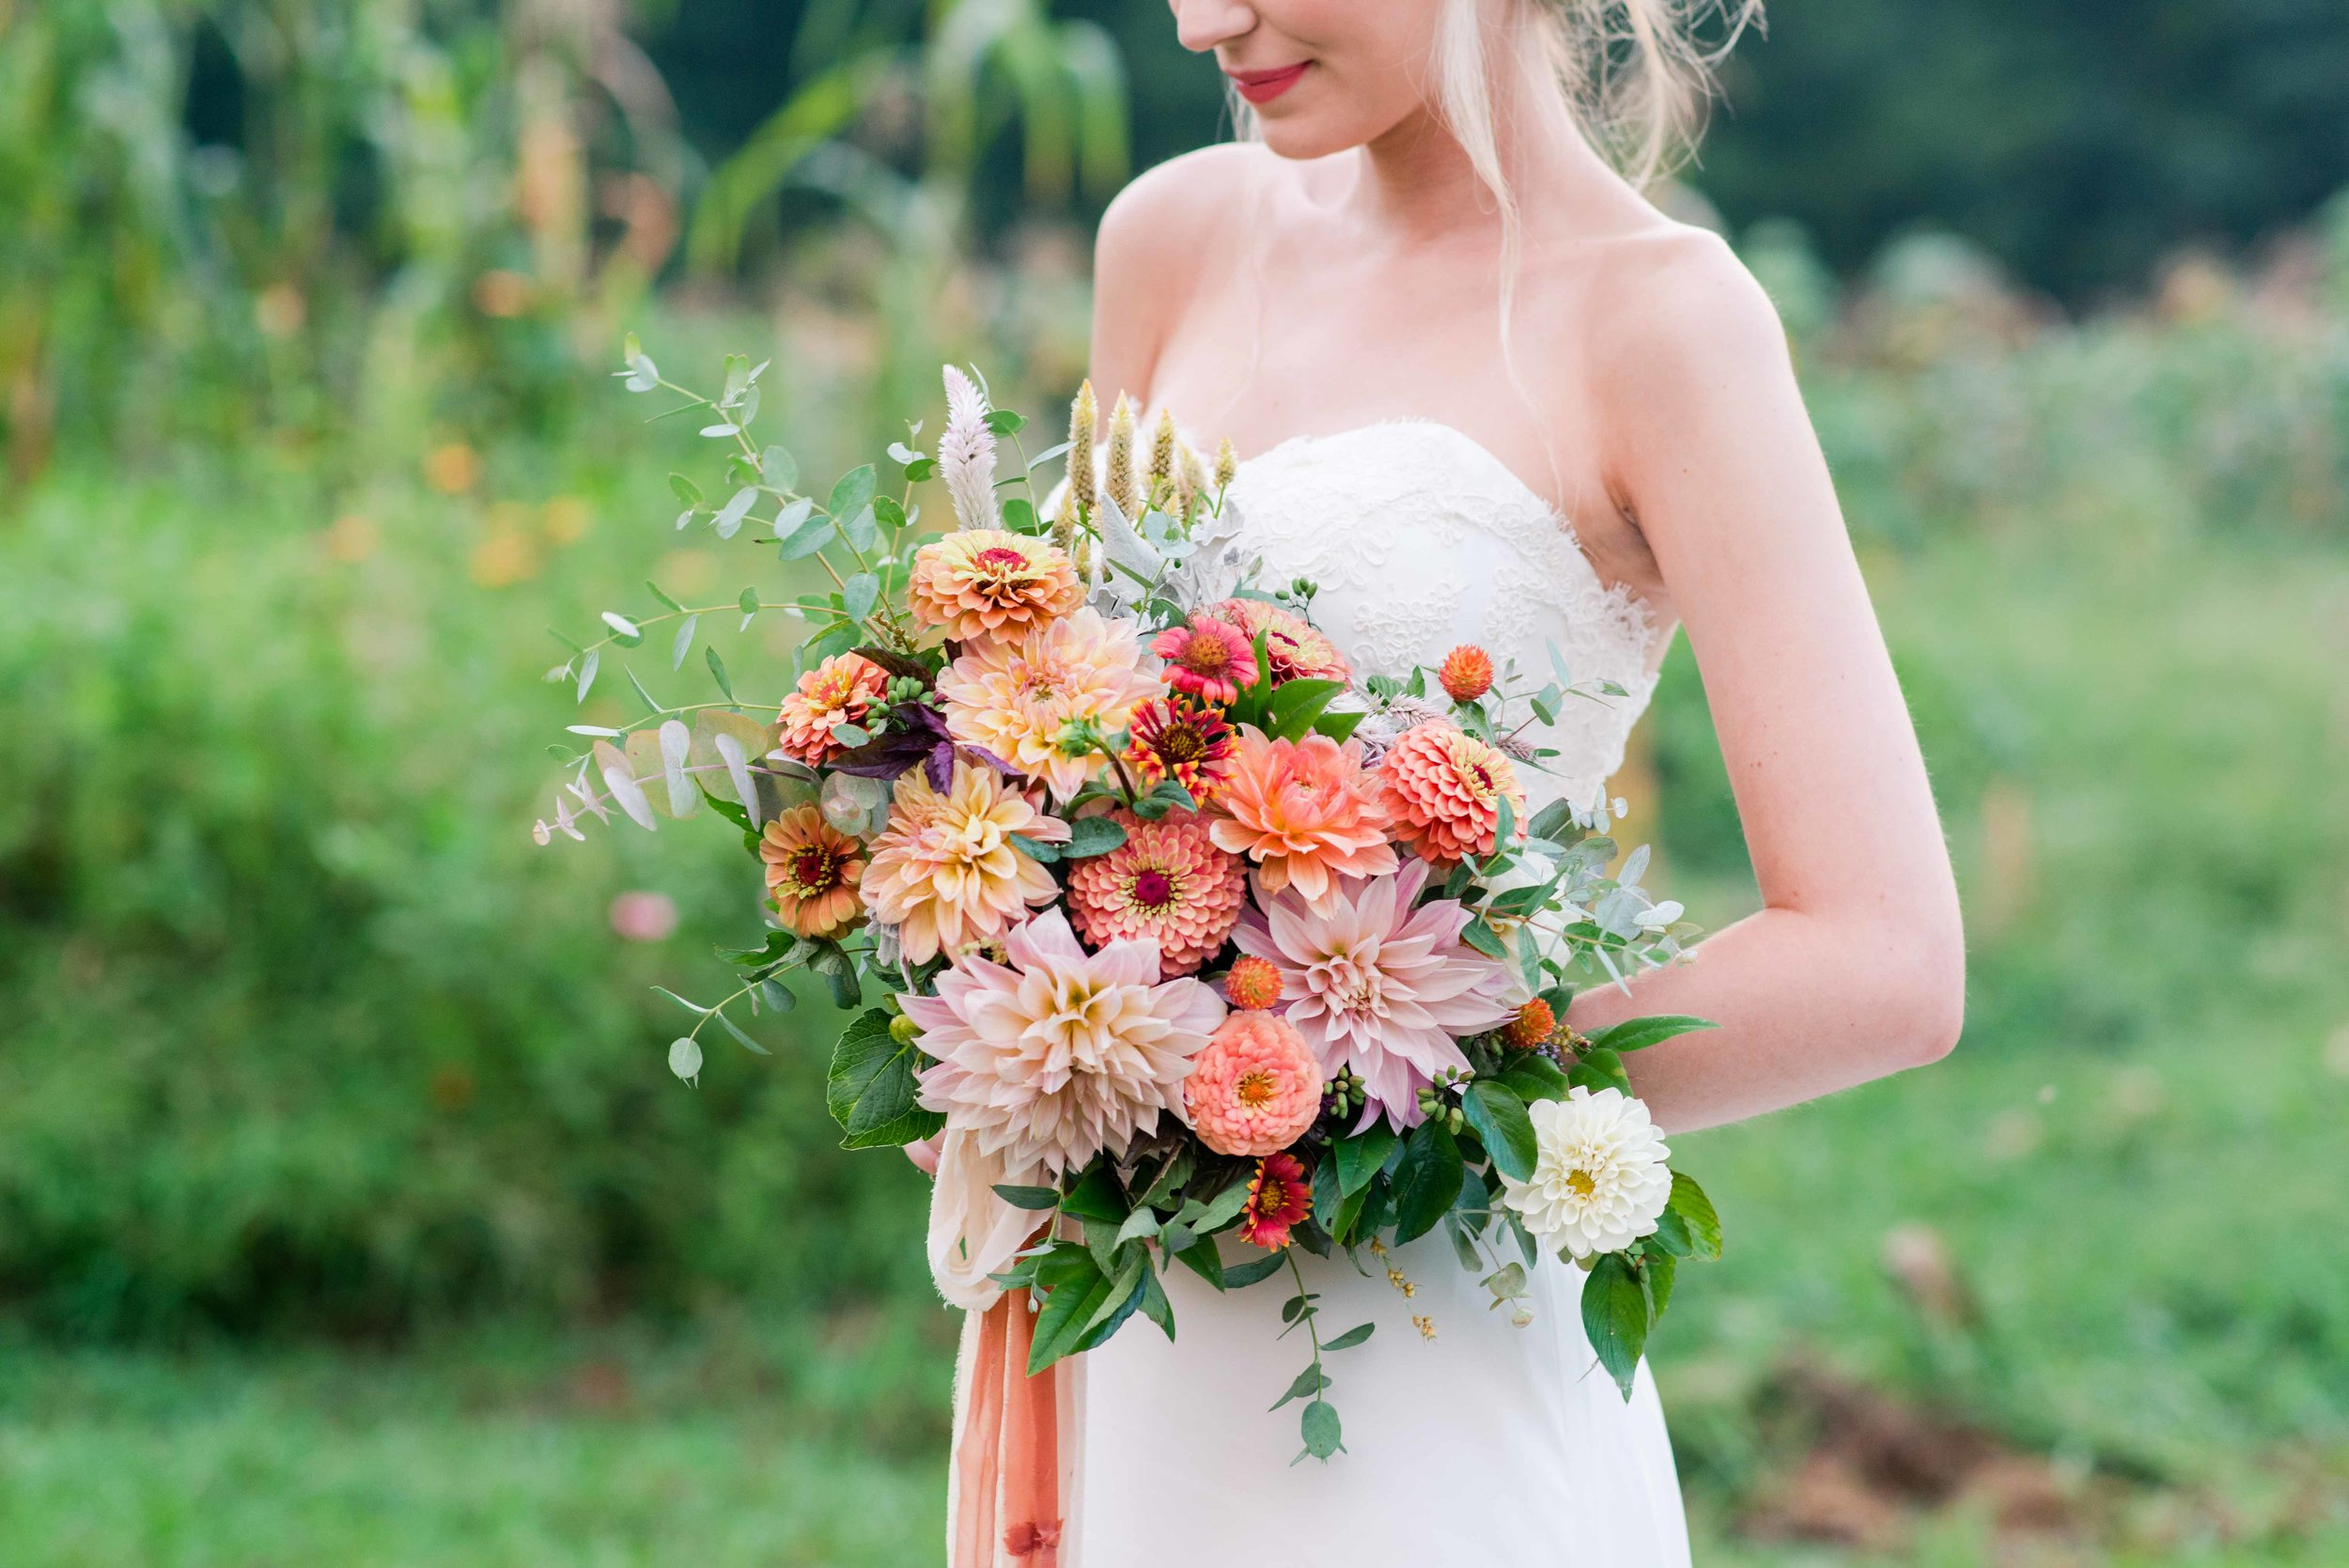 Farmer Florist Styled Shoot Birmingham Alabama Deborah Michelle Photography -170.jpg